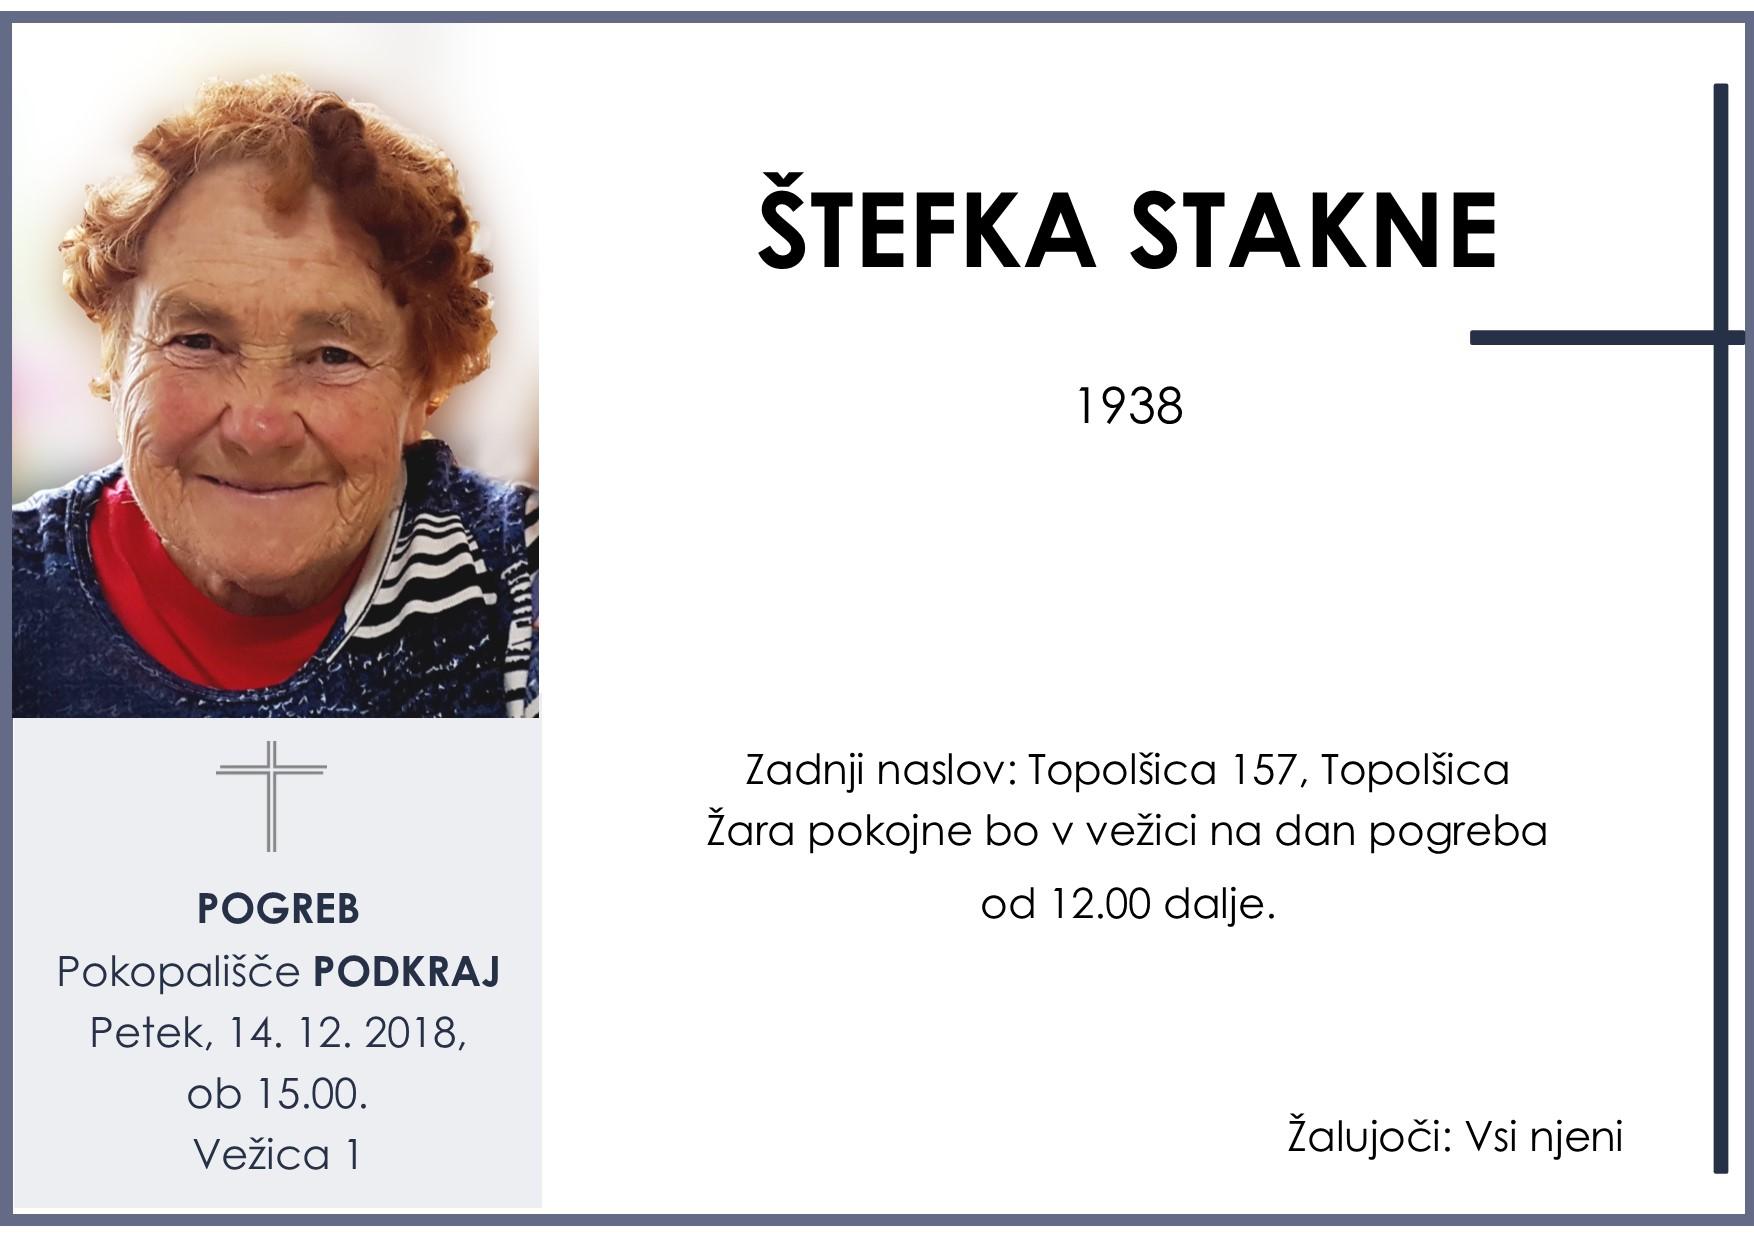 ŠTEFKA STAKNE, Podkraj, 14. 12. 2018